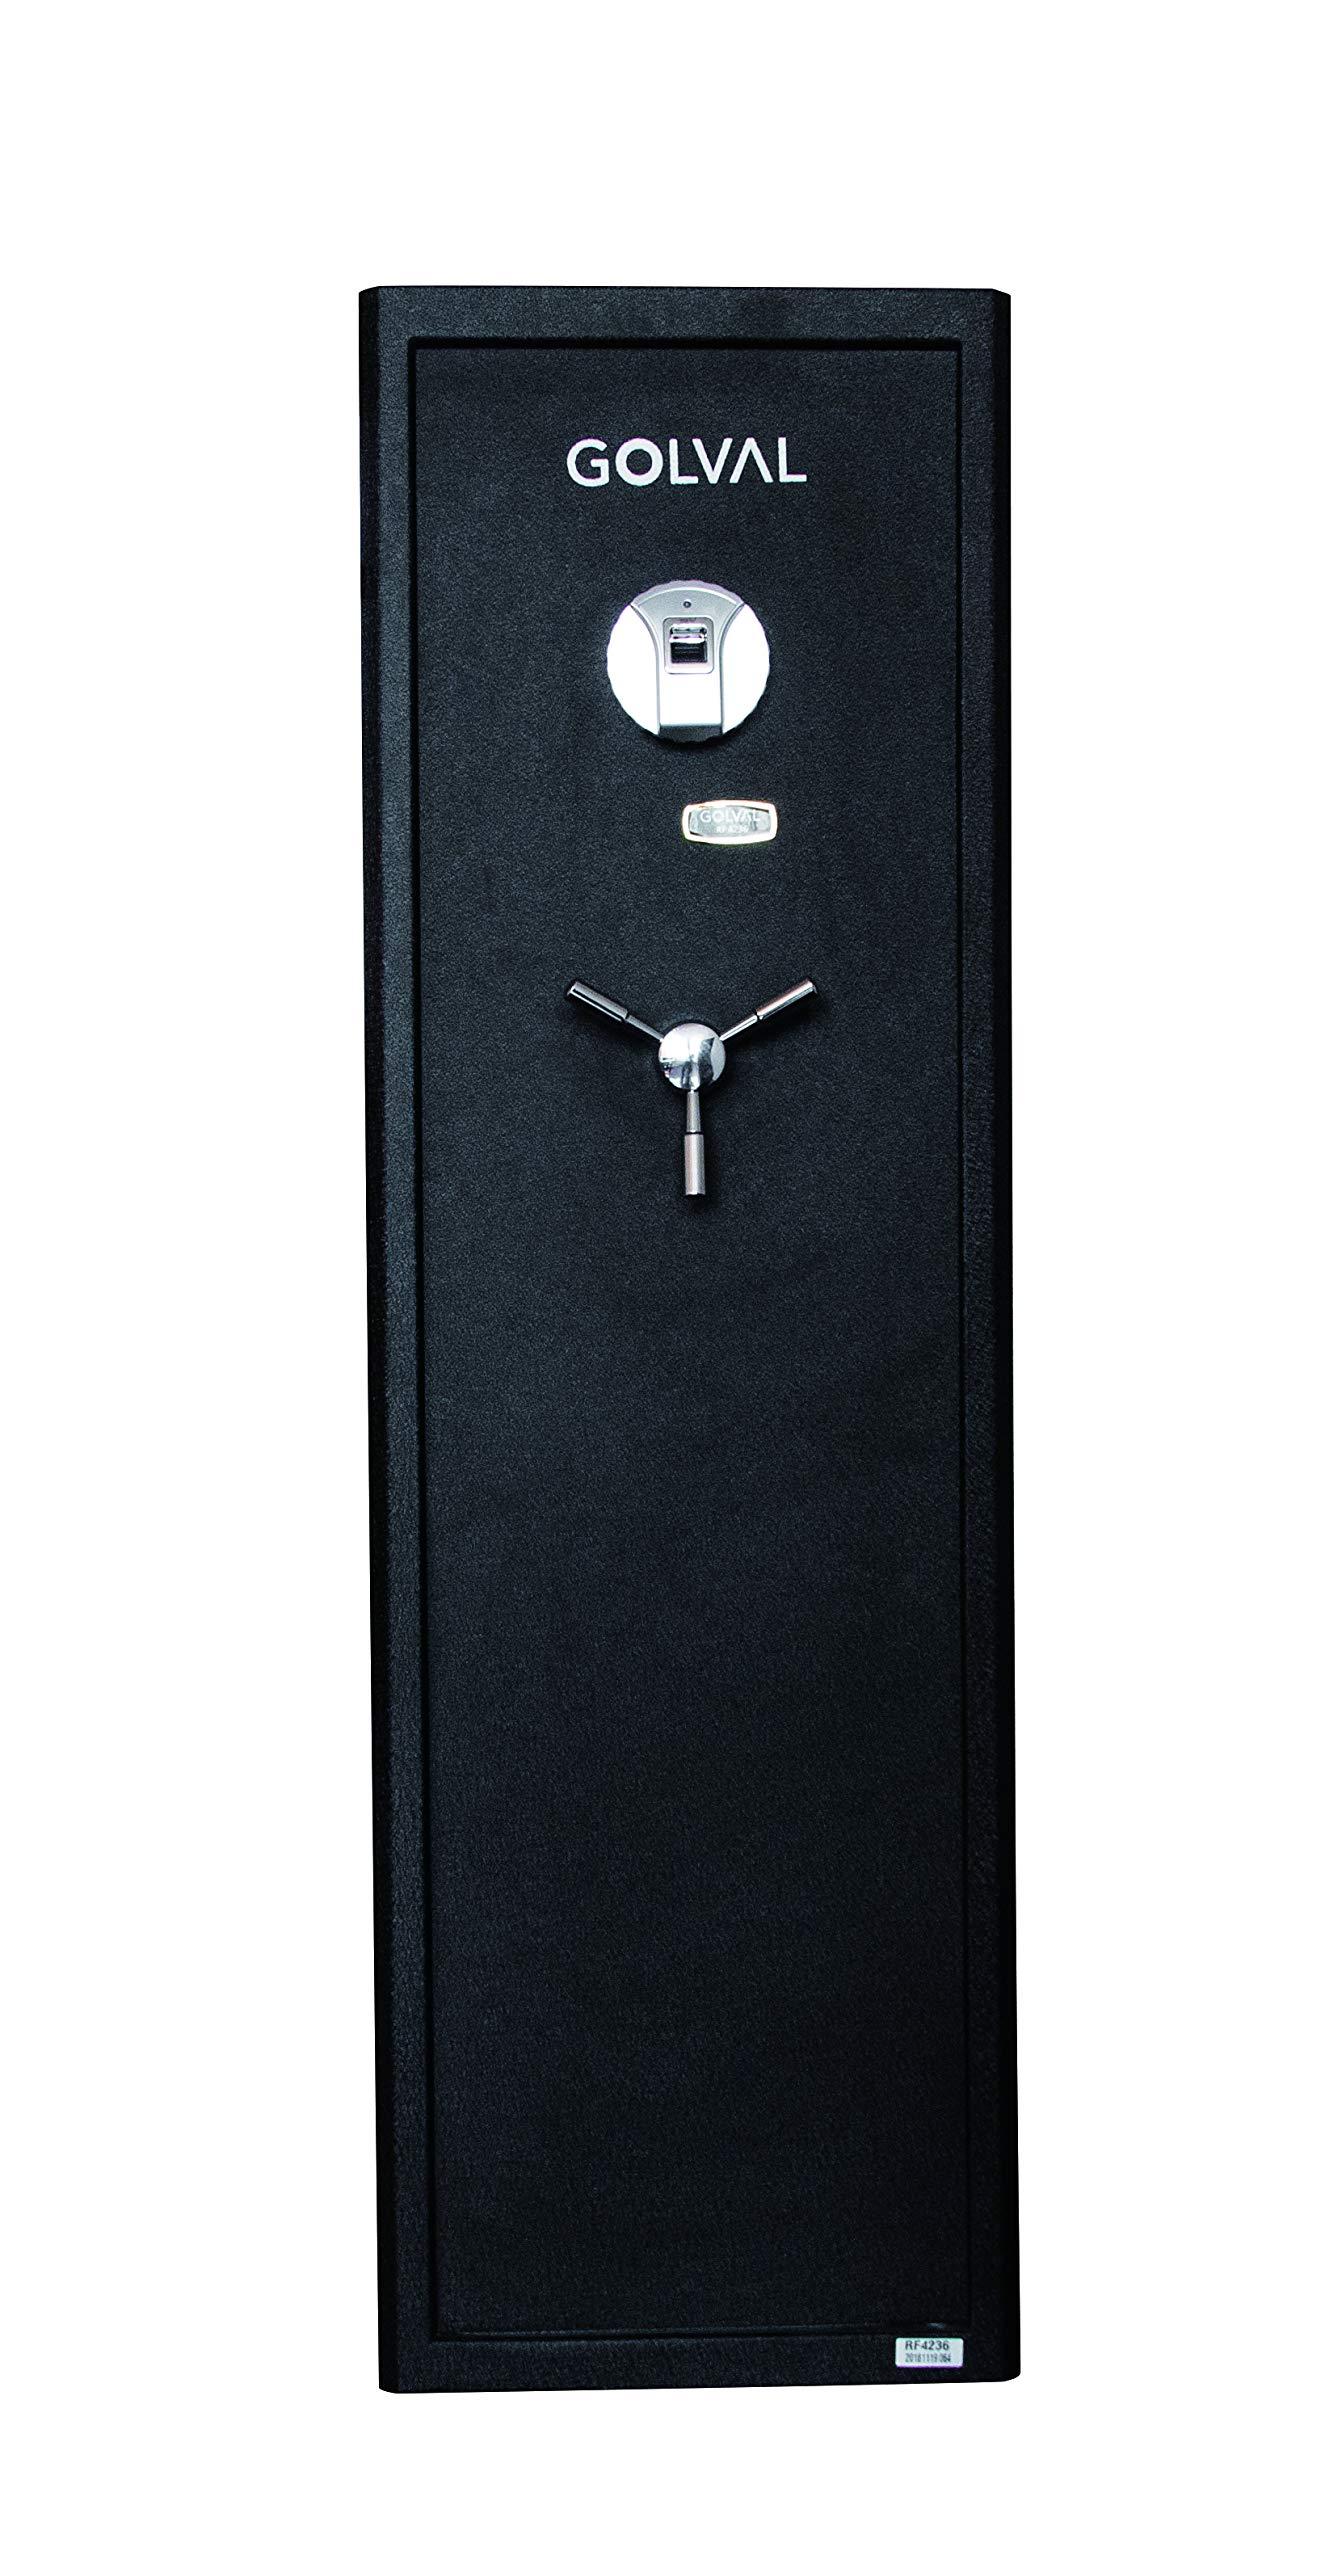 Golval RF4236 Large Quick Access Biometric Rifle Safe,Gun Safe,Cabinet 8 Guns by Golval